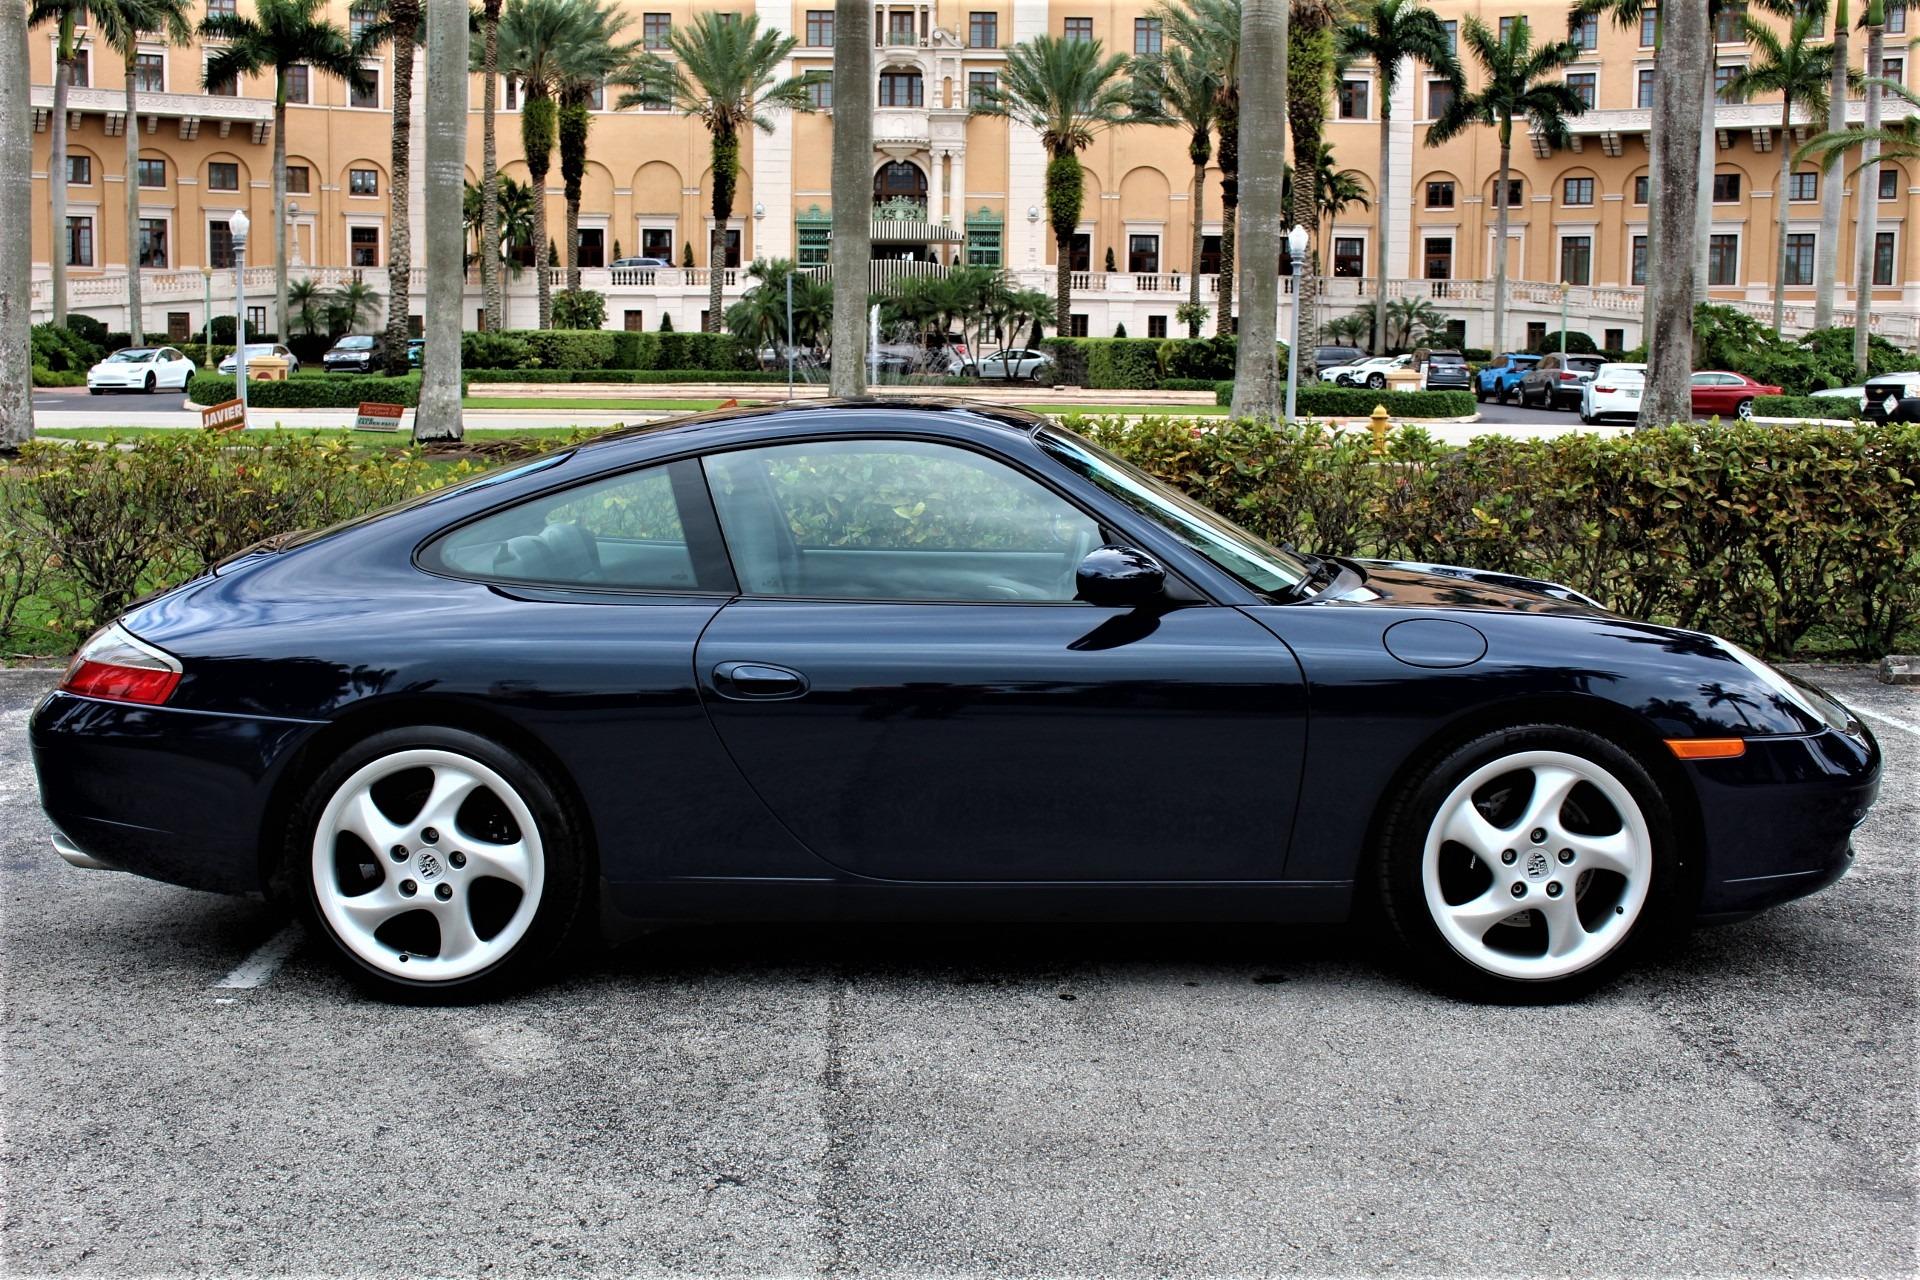 Used 2000 Porsche 911 Carrera for sale $39,850 at The Gables Sports Cars in Miami FL 33146 2